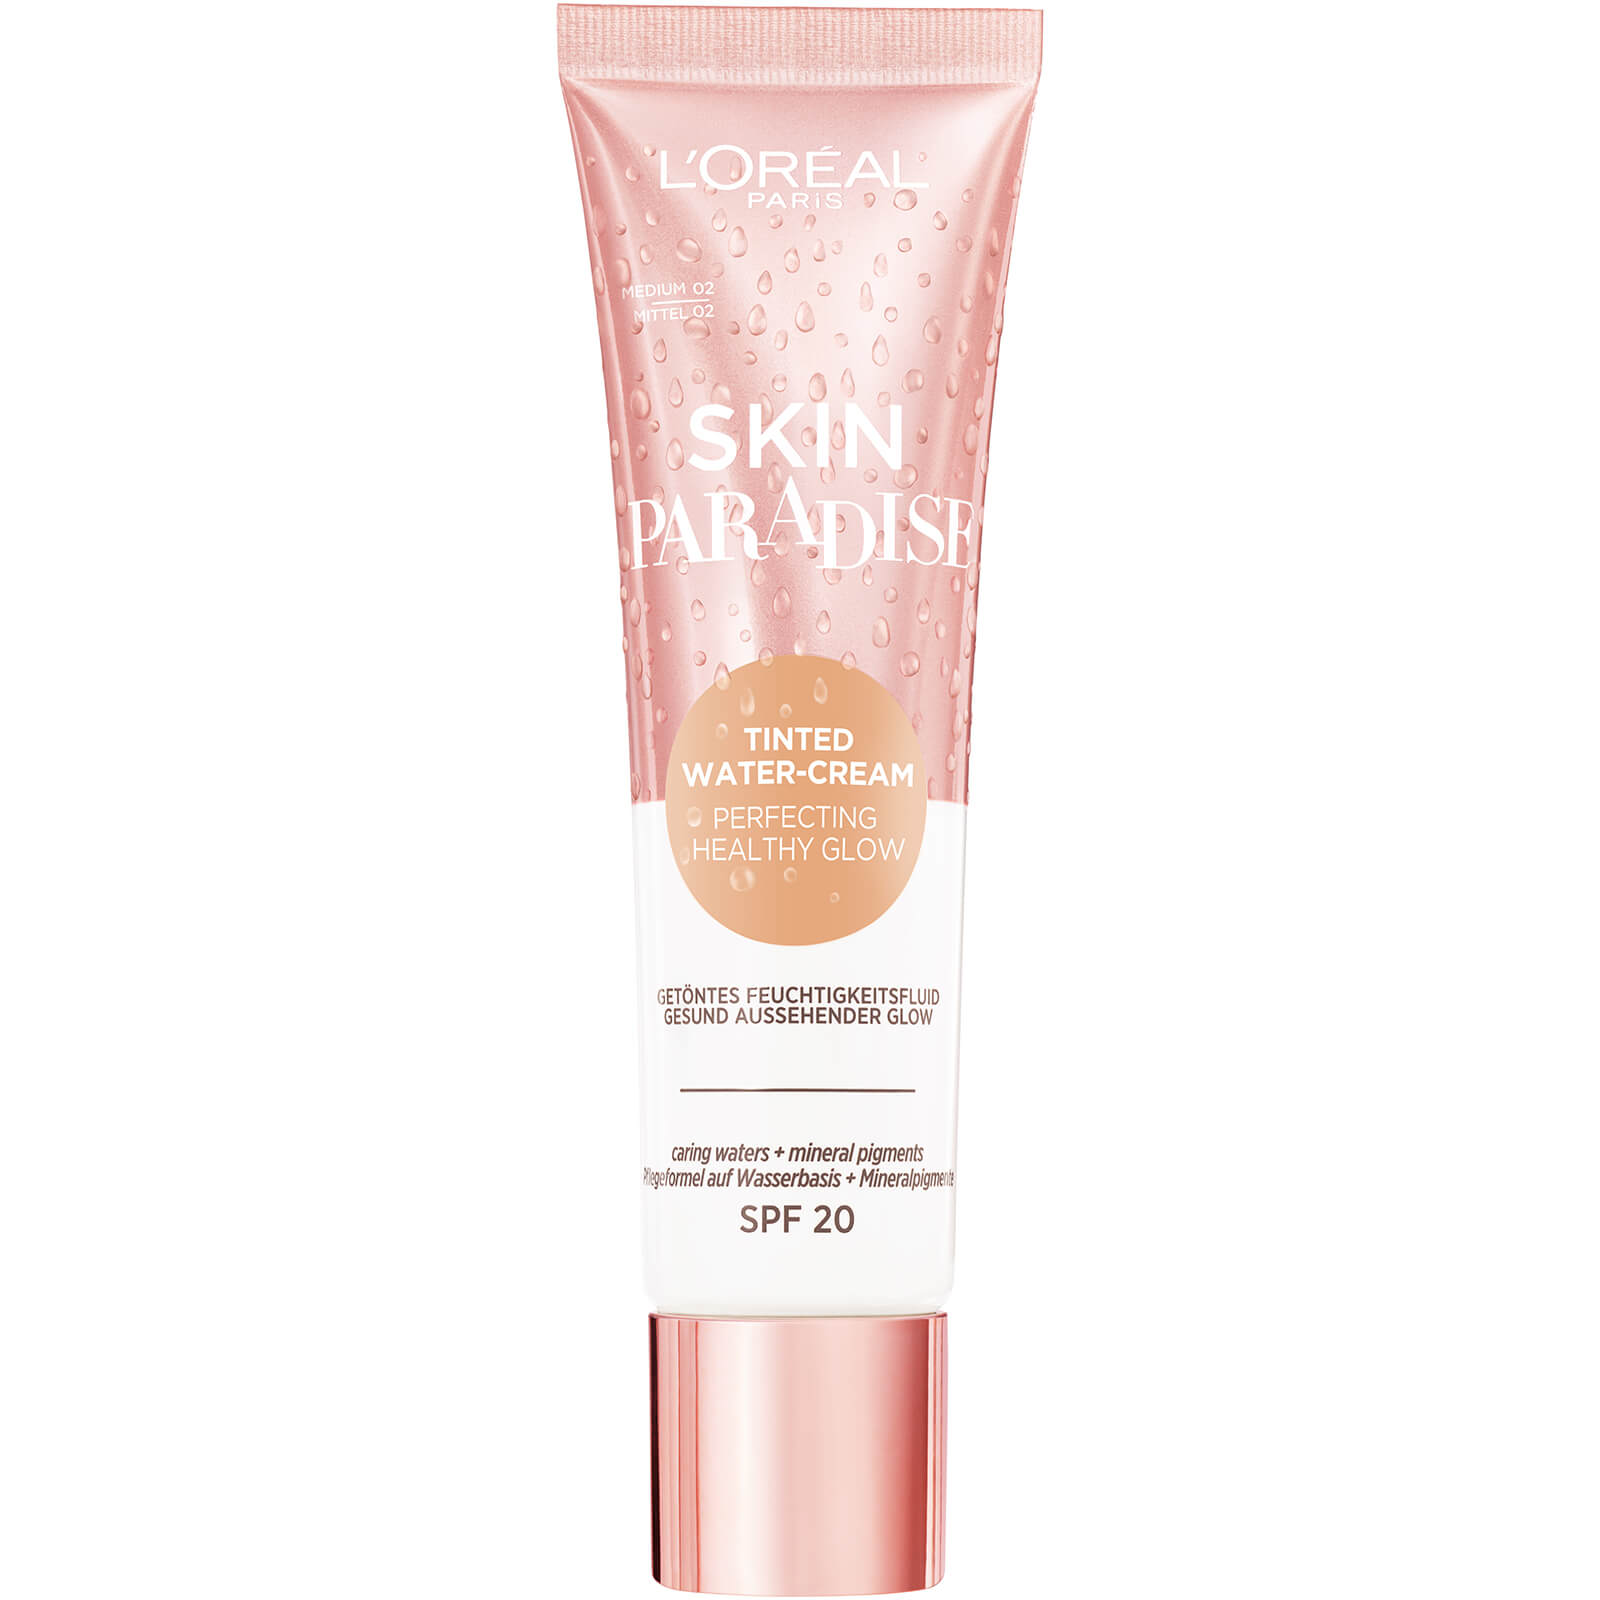 Купить L'Oréal Paris Skin Paradise Tinted Moisturiser SPF20 30ml (Various Shades) - Medium 02